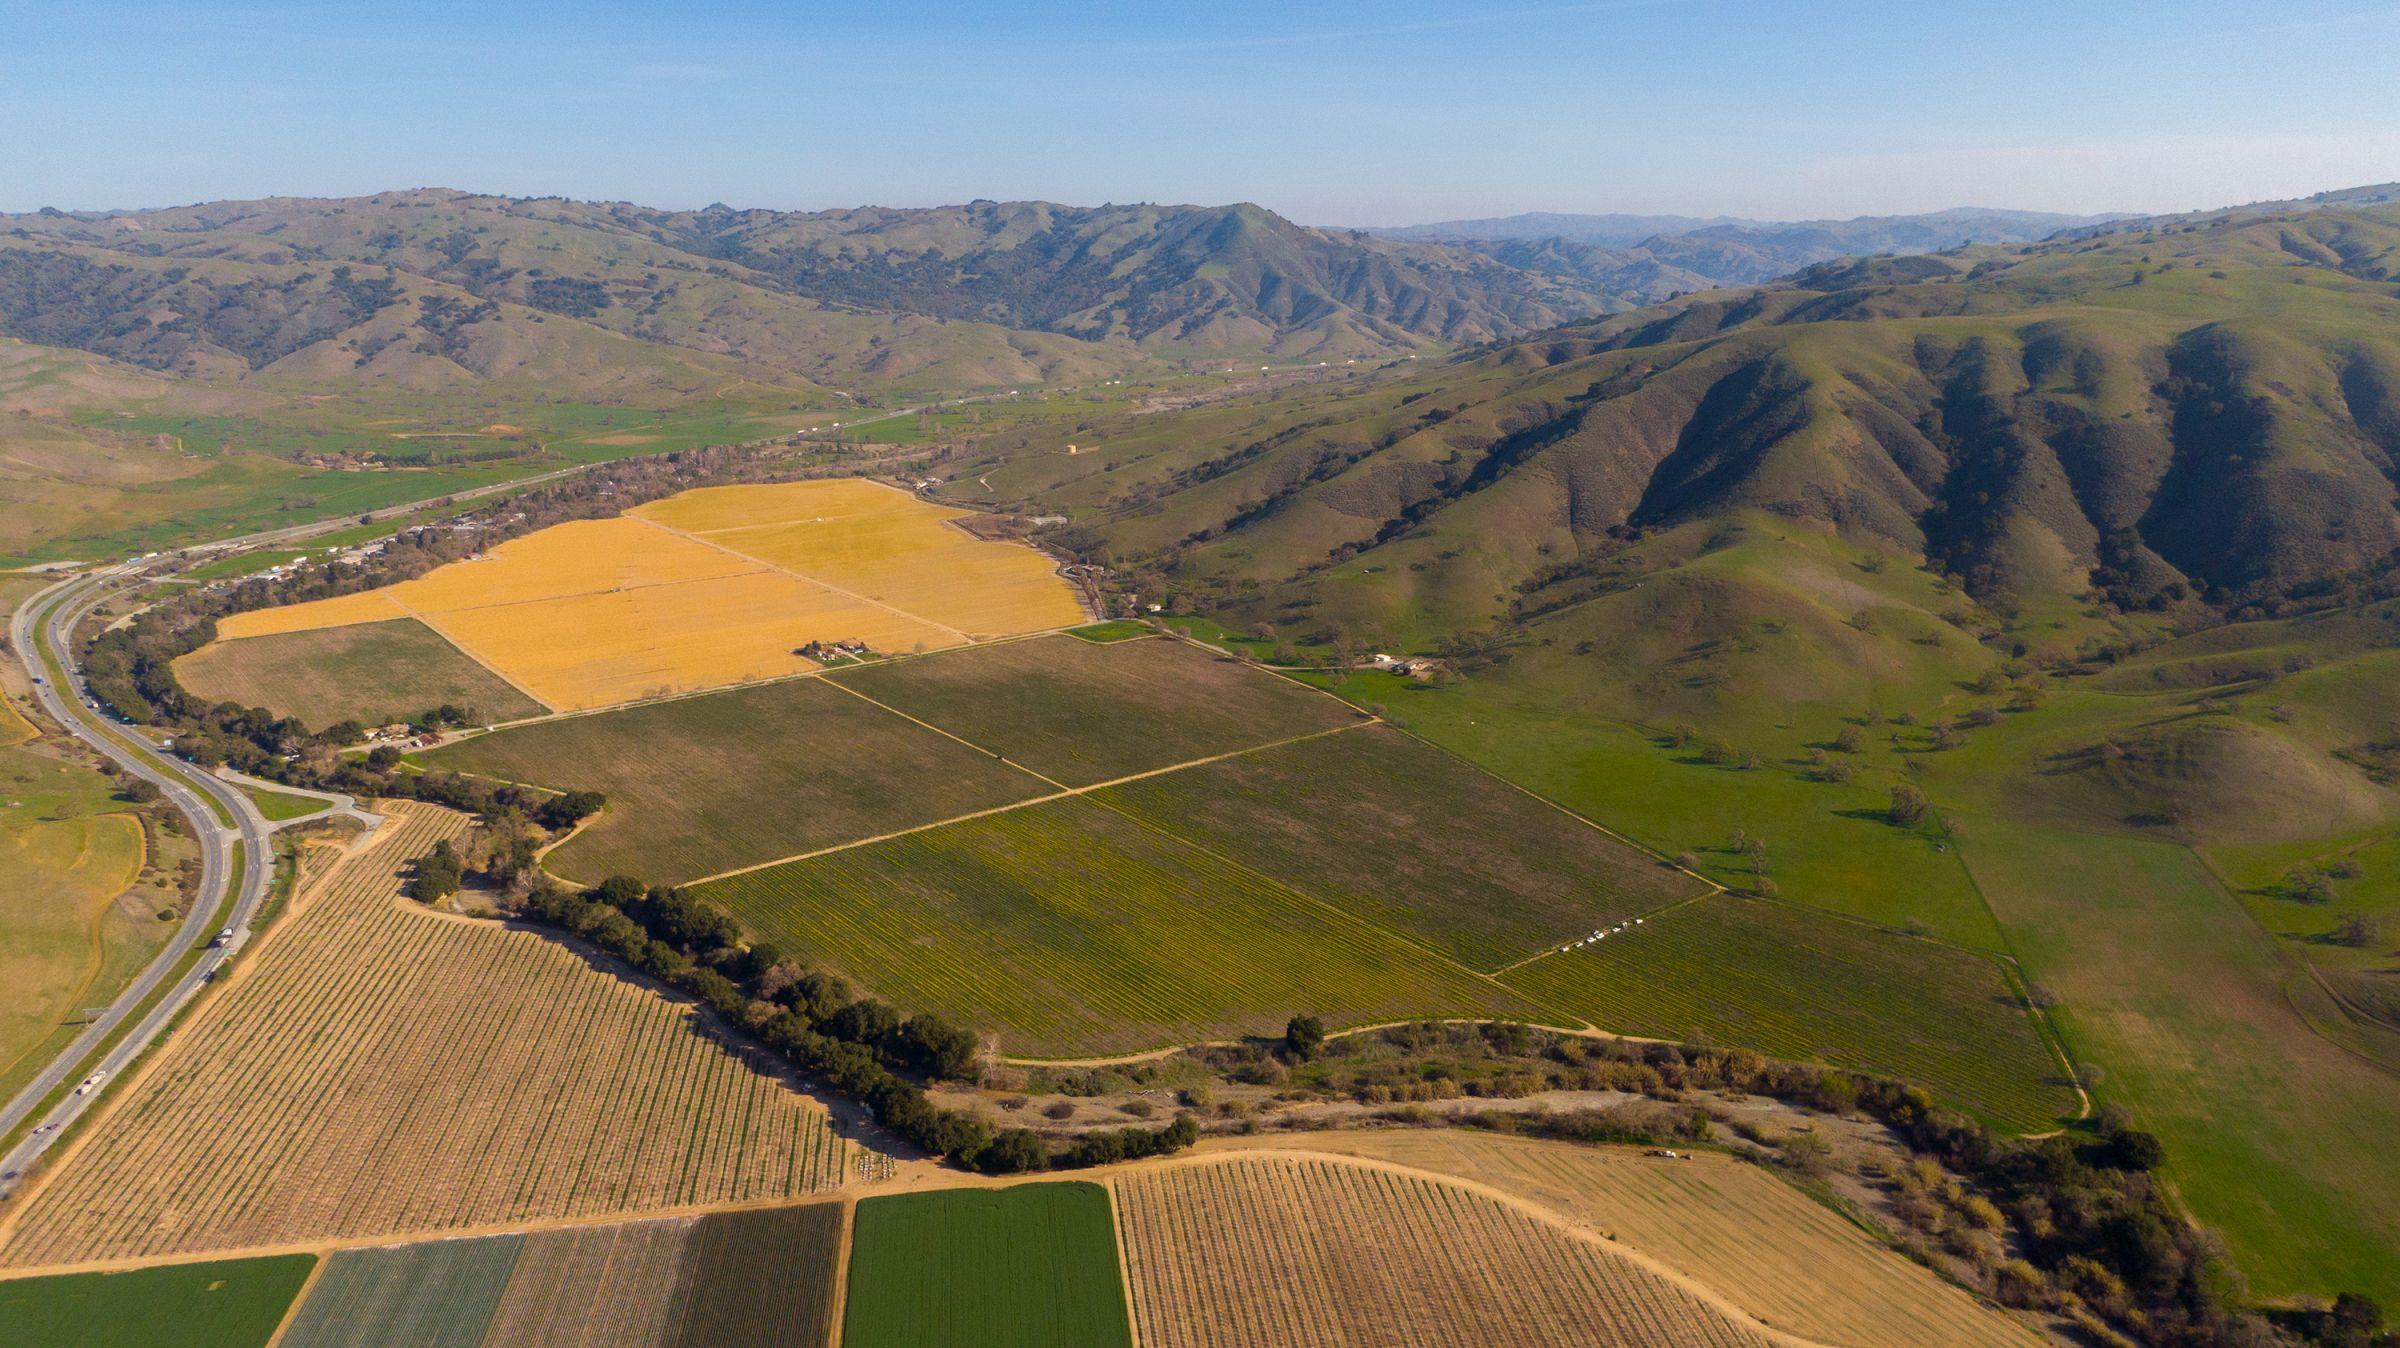 santa-clara-county-california-497-acres-listing-number-15435-1-2021-03-30-213026.jpg